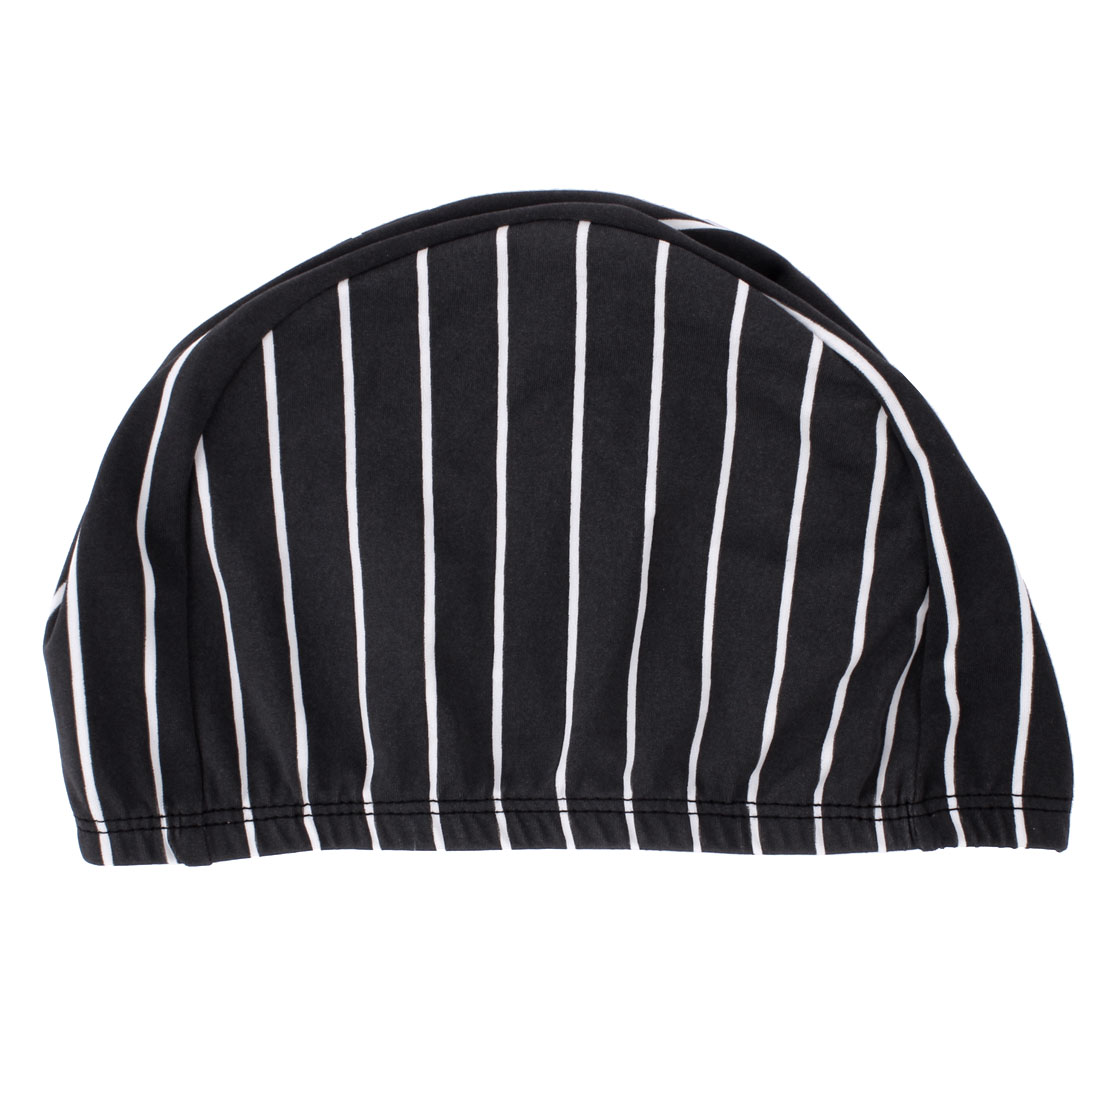 Men Women Striped Pattern Stretchy Swimming Pool Bathing Swim Hat Cap Dark Gray